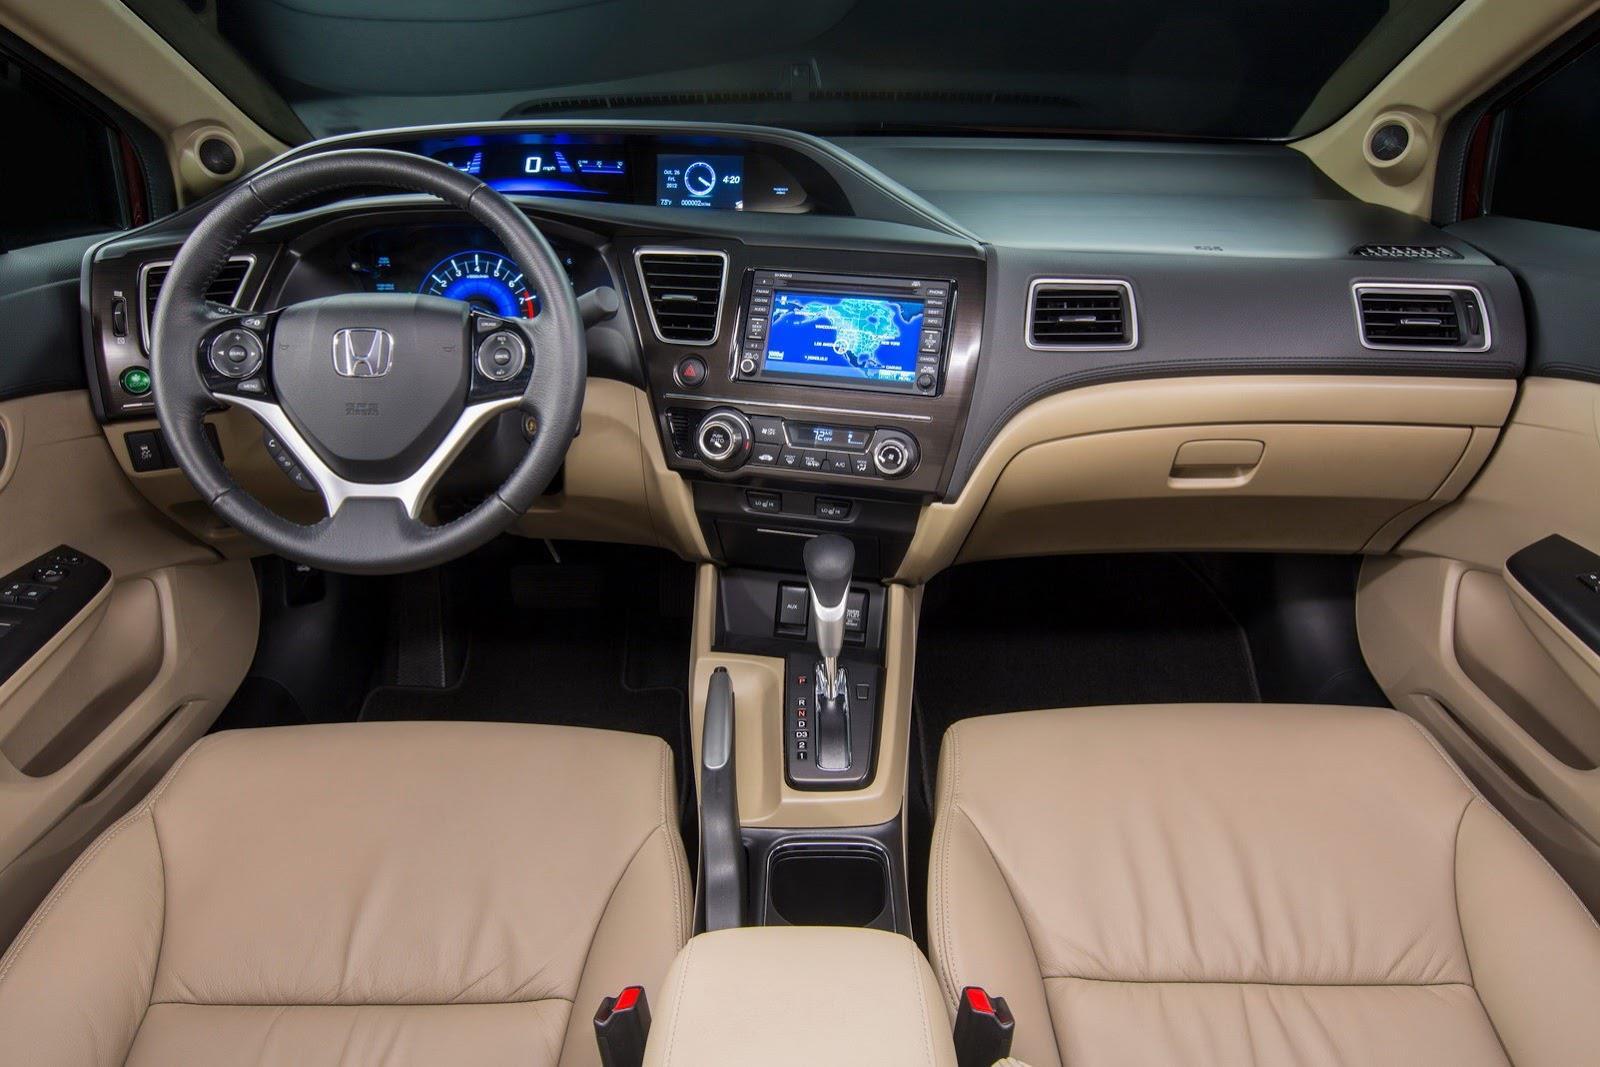 http://1.bp.blogspot.com/-mFRz1cFS6fI/ULqmCEJ68NI/AAAAAAAArpg/0T2_GYuvIic/s1600/2013-Honda-Civic-Sedan-11.jpg